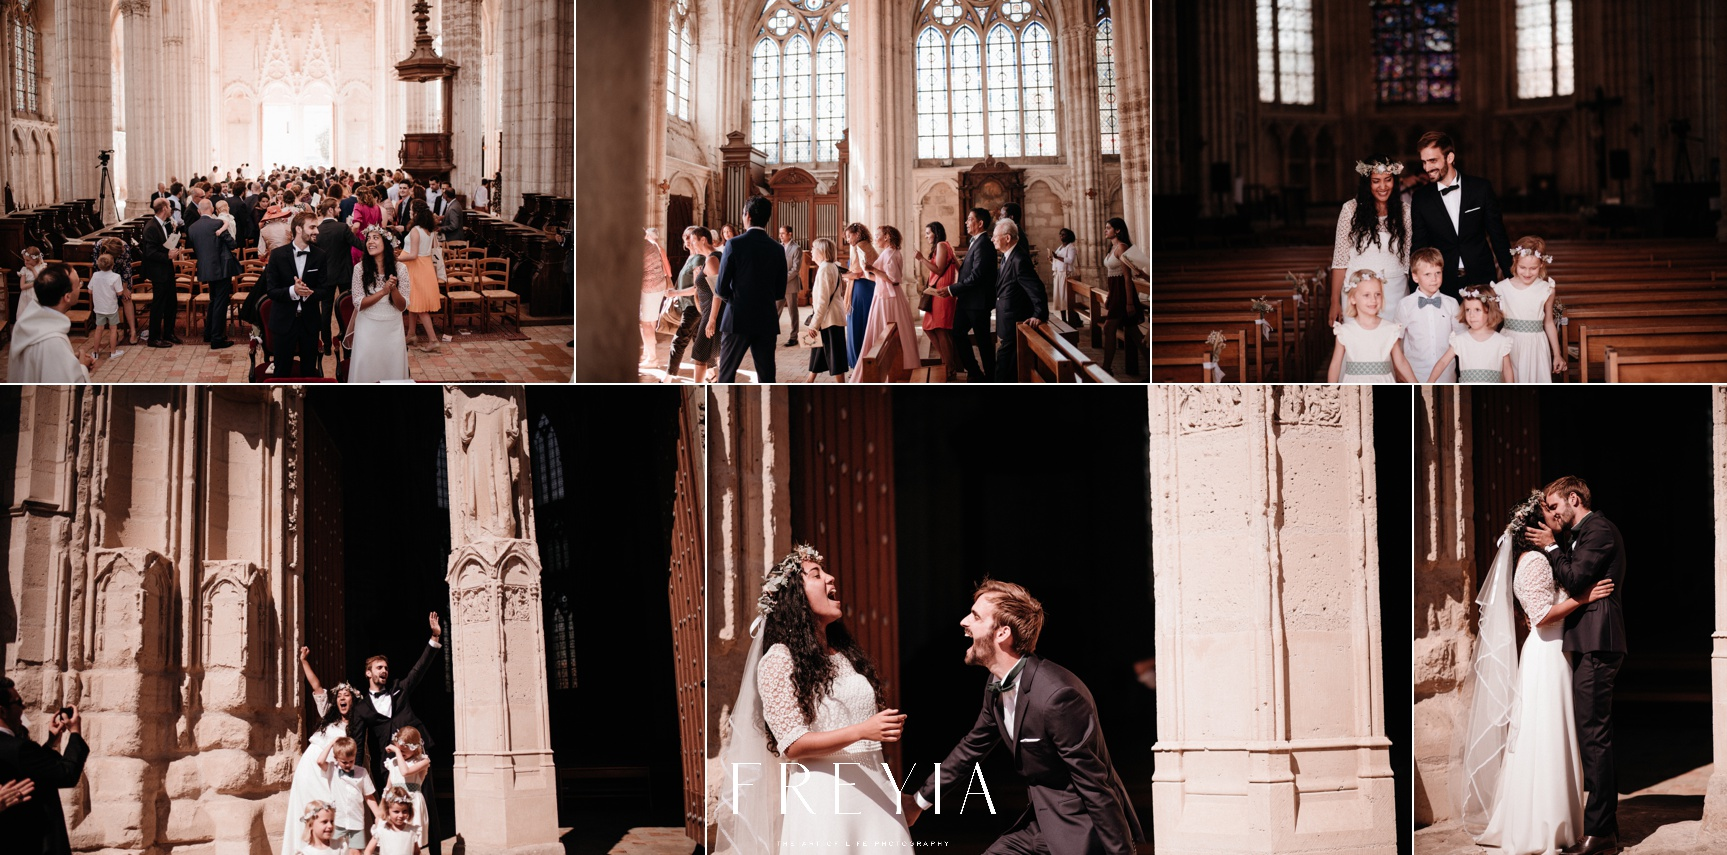 R + T |  mariage reportage alternatif moody intime minimaliste vintage naturel boho boheme |  PHOTOGRAPHE mariage PARIS france destination  | FREYIA photography_-158.jpg